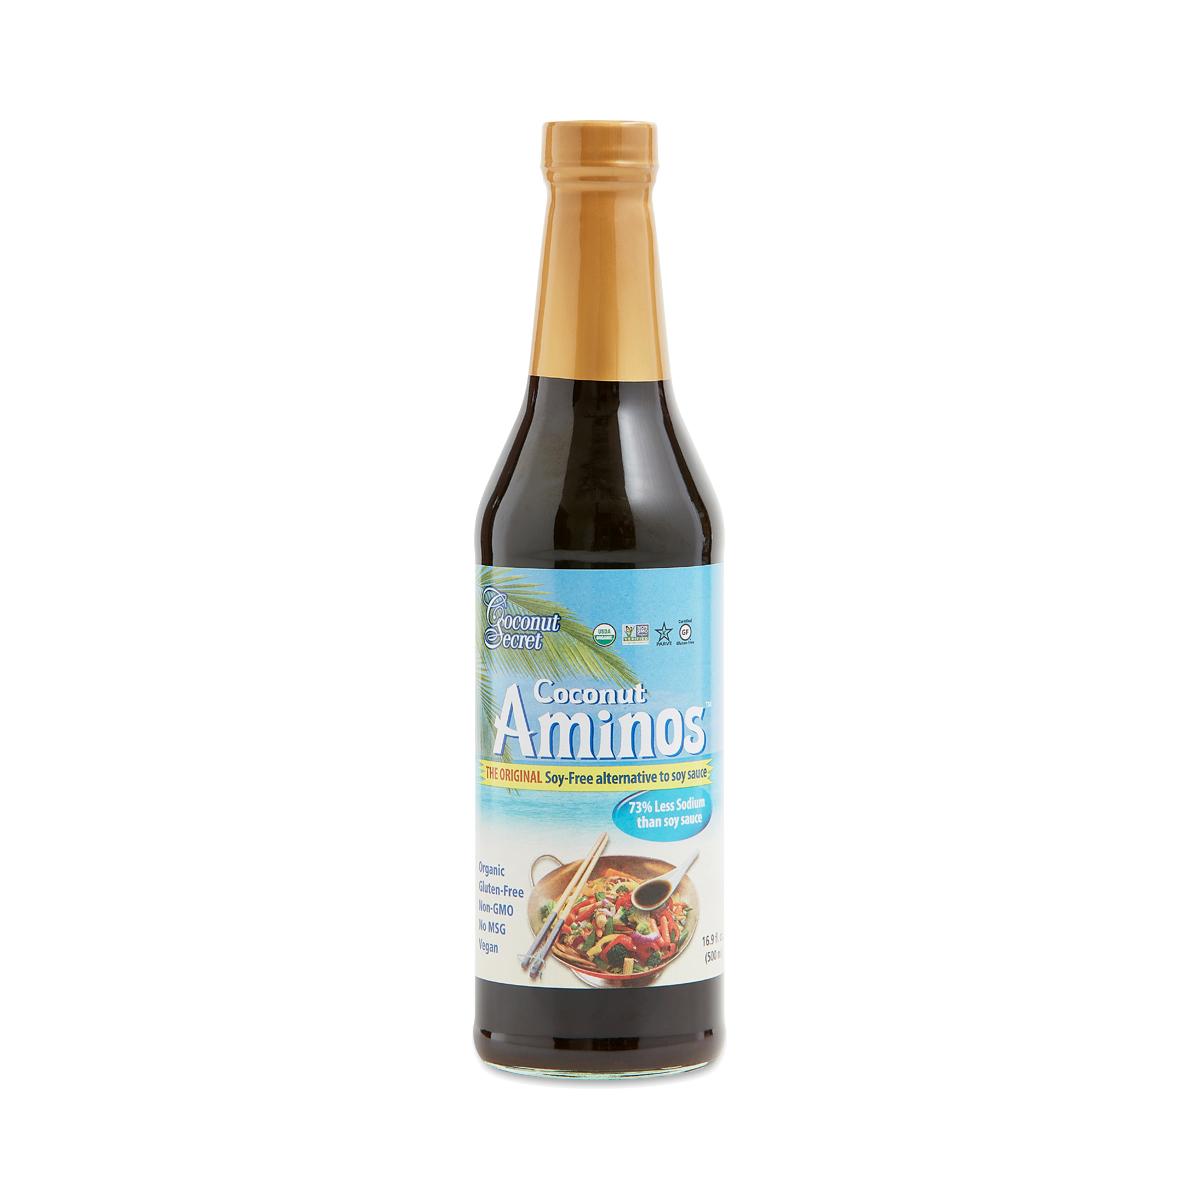 Coconut Secret Coconut Aminos 16.9 oz bottle